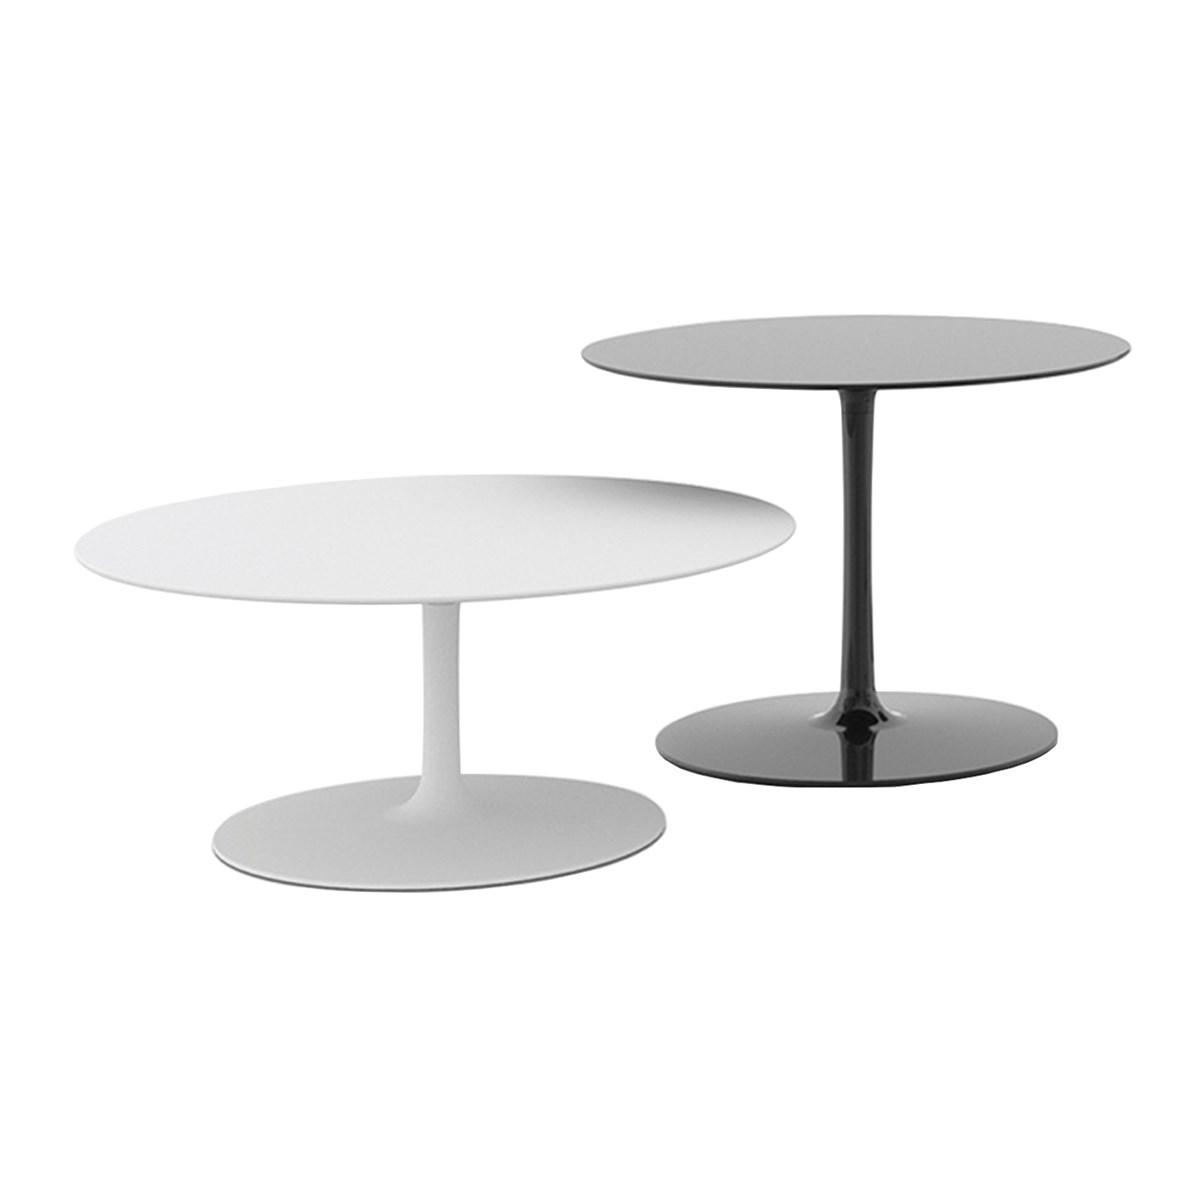 MDF-Italia-Jean-Marie-Massaud-Flow-Low-Table-Matisse-1